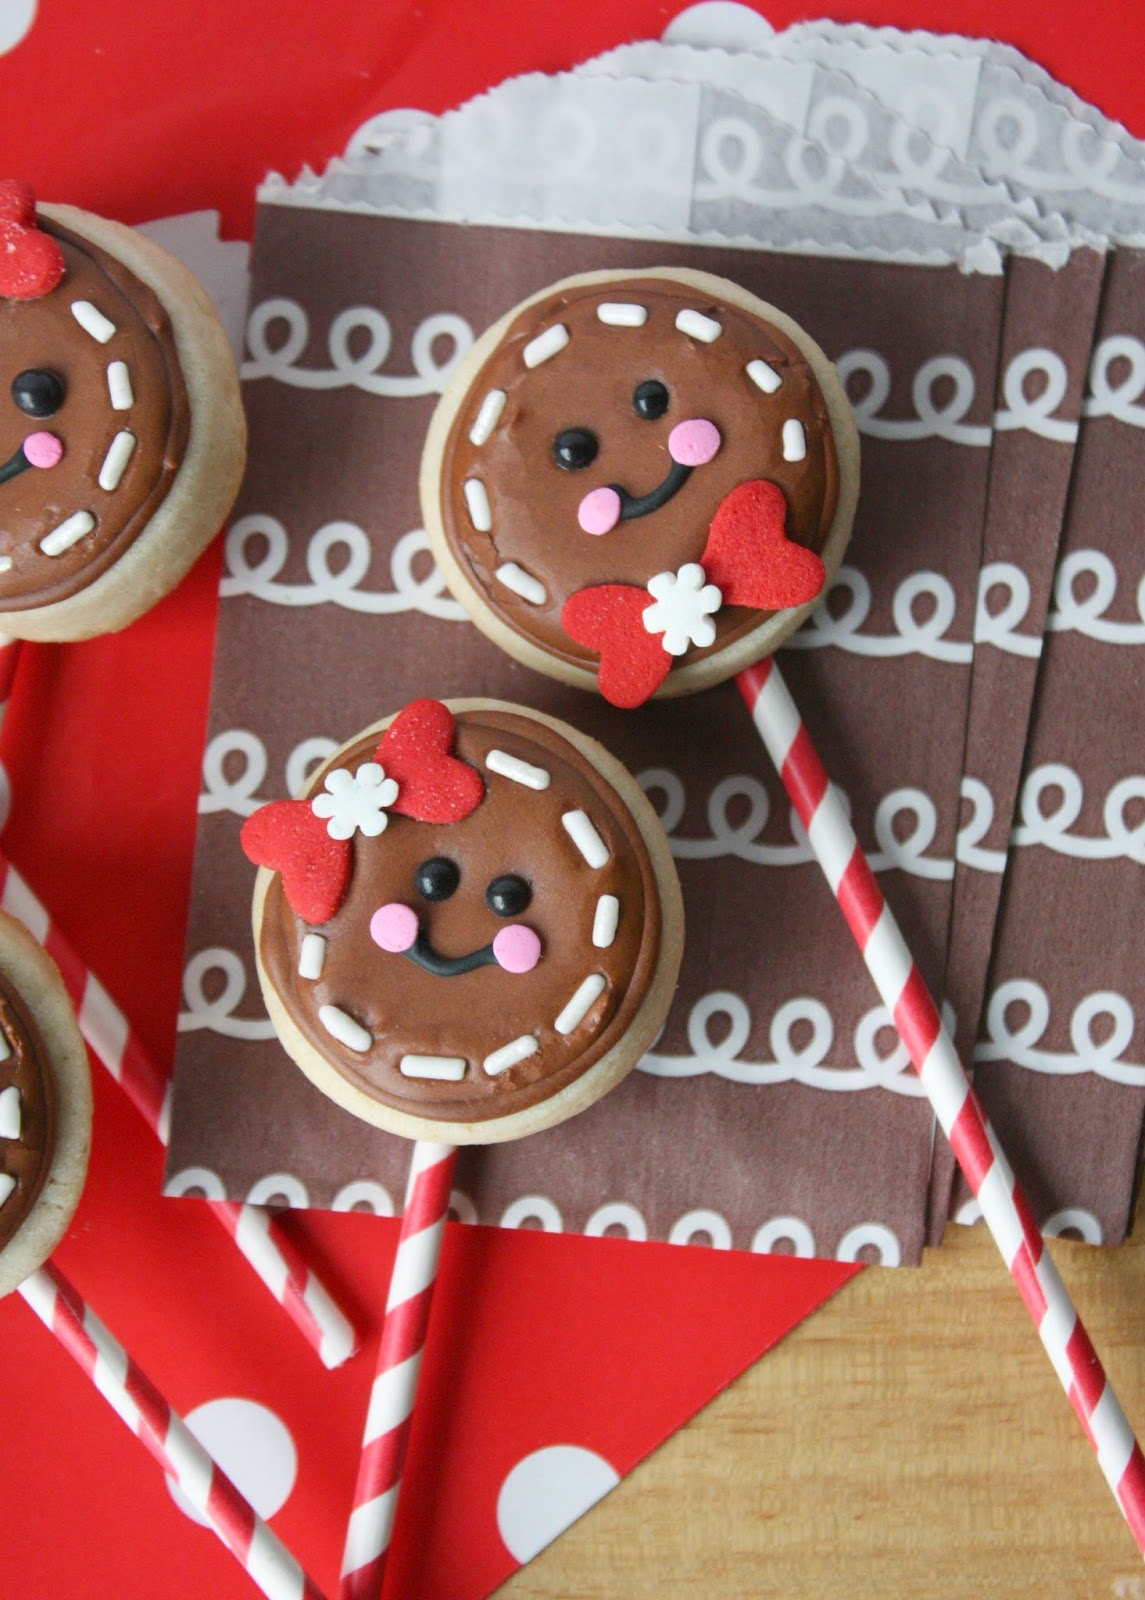 Christmas sugar cookie decorating ideas - 25 Easy Christmas Sugar Cookies Recipes Decorating Ideas For Holiday Sugar Cookies